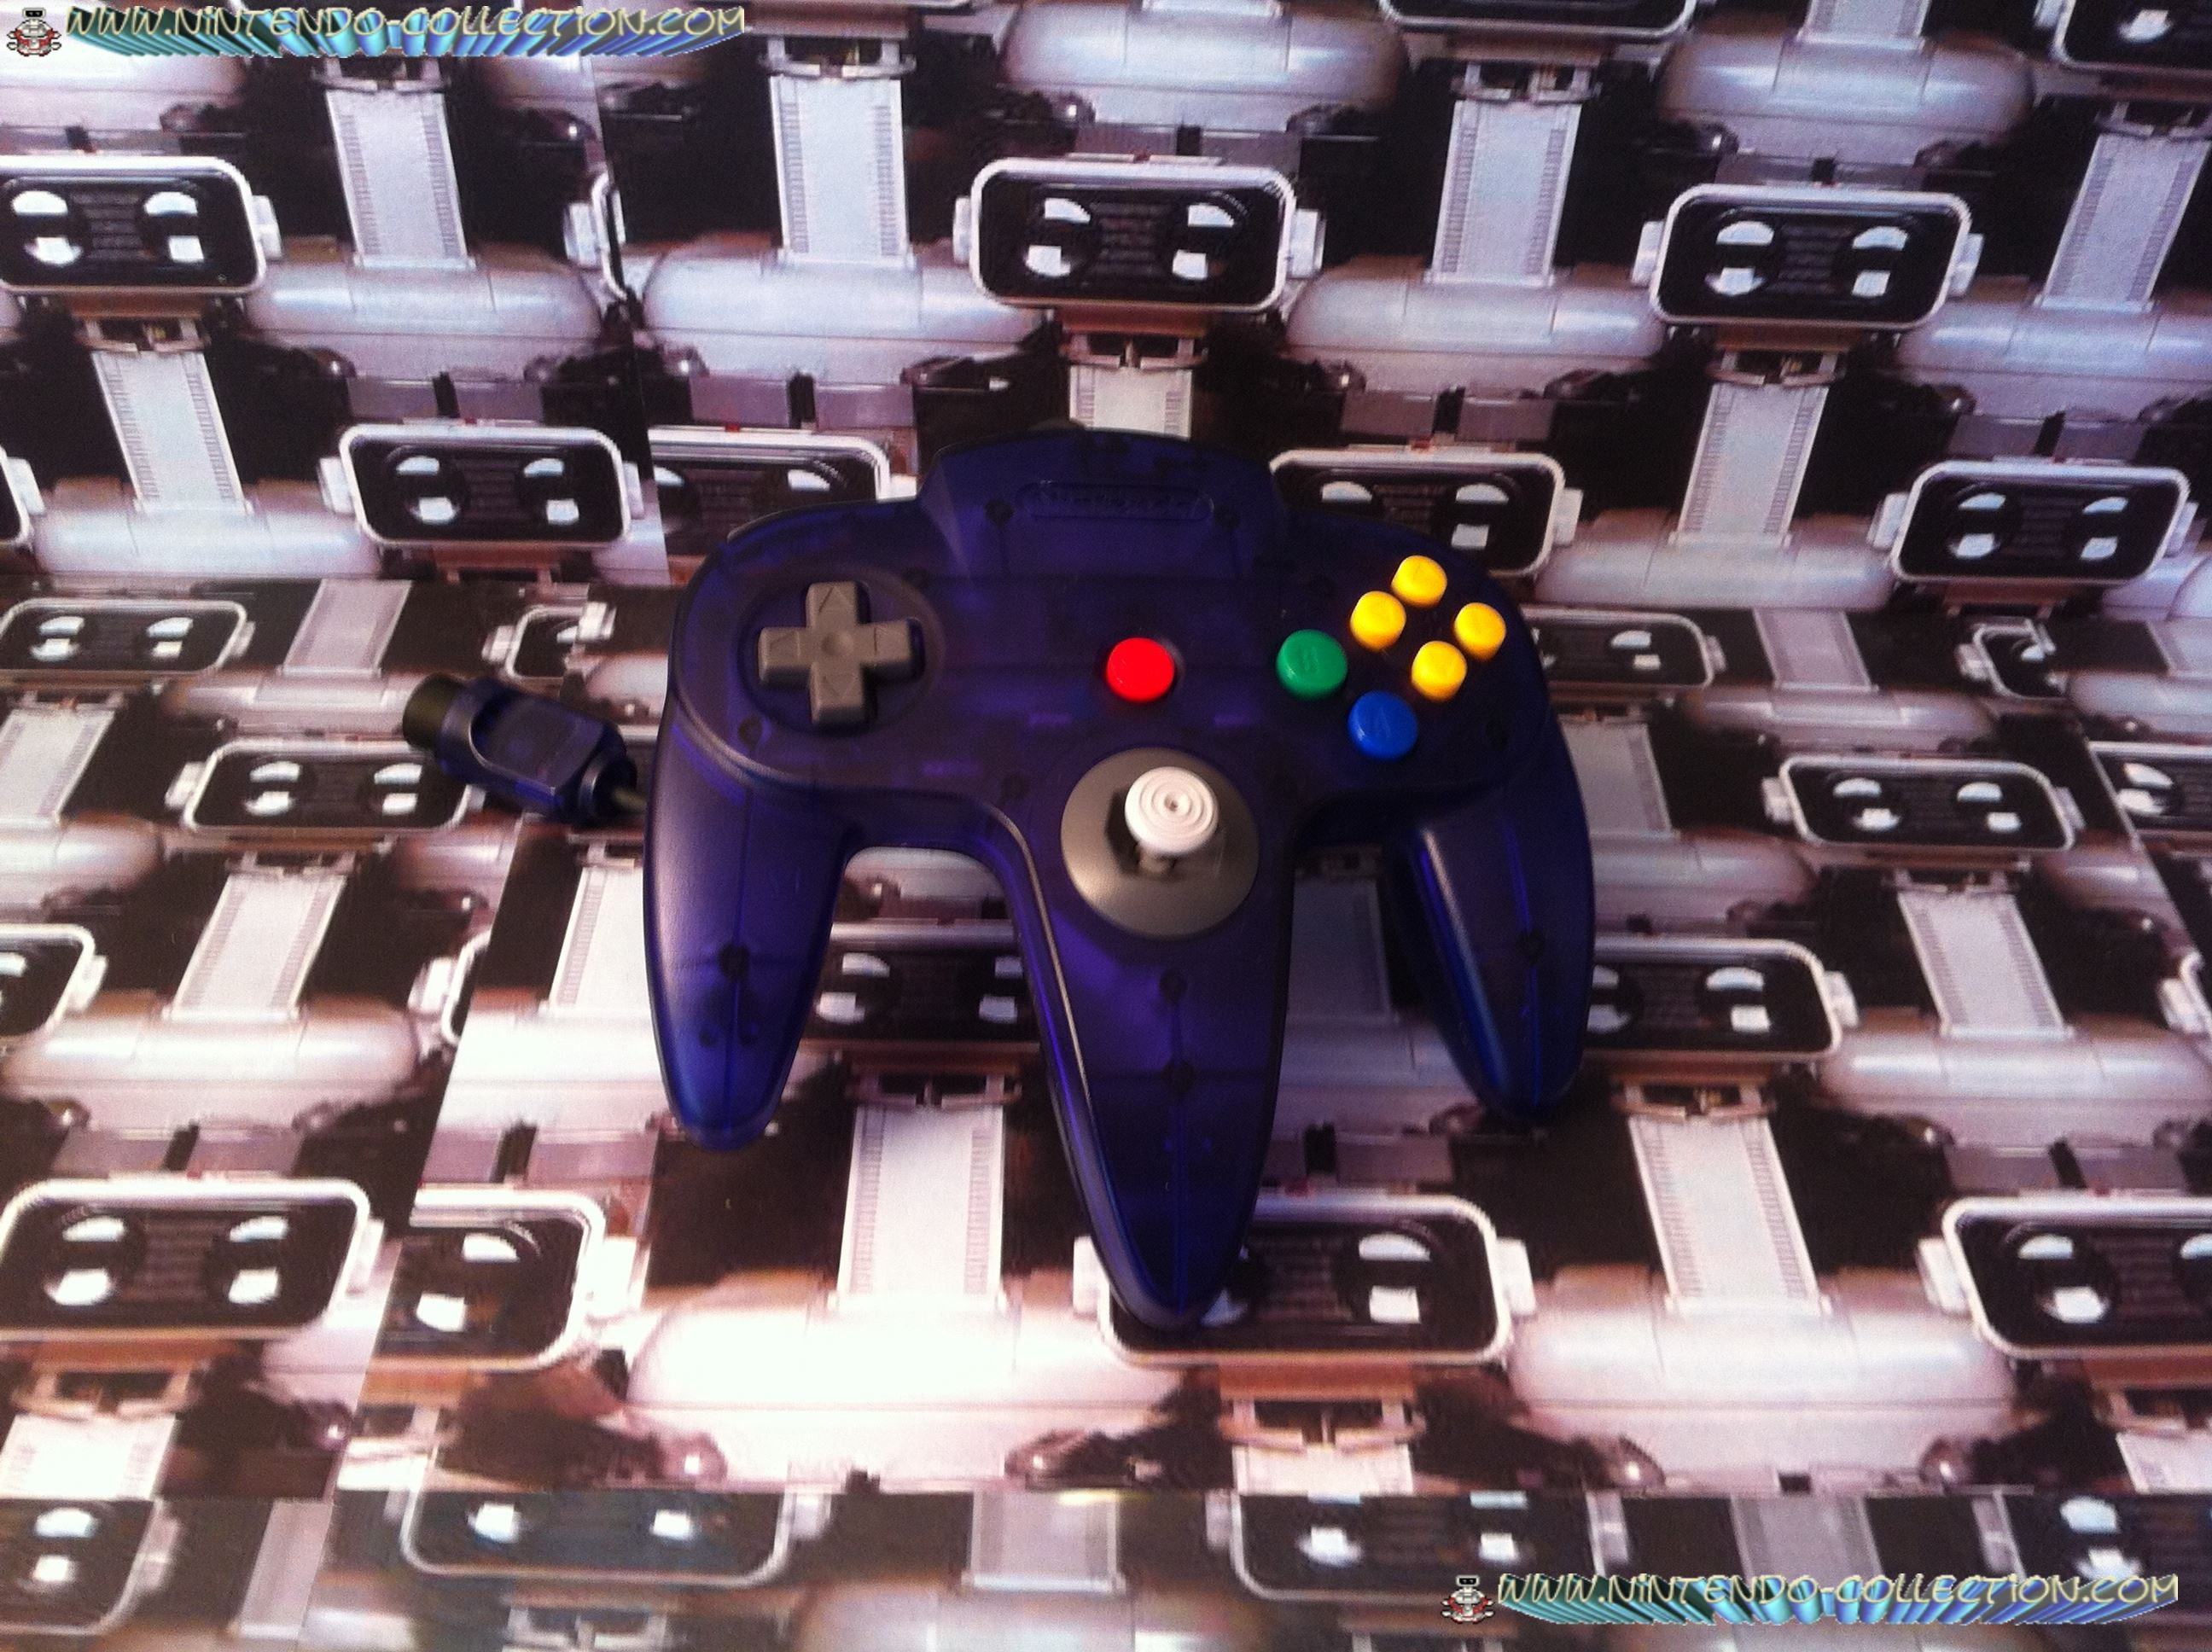 www.nintendo-collection.com  - Nintendo N64 Controller Clear purple Manette  violette transparente